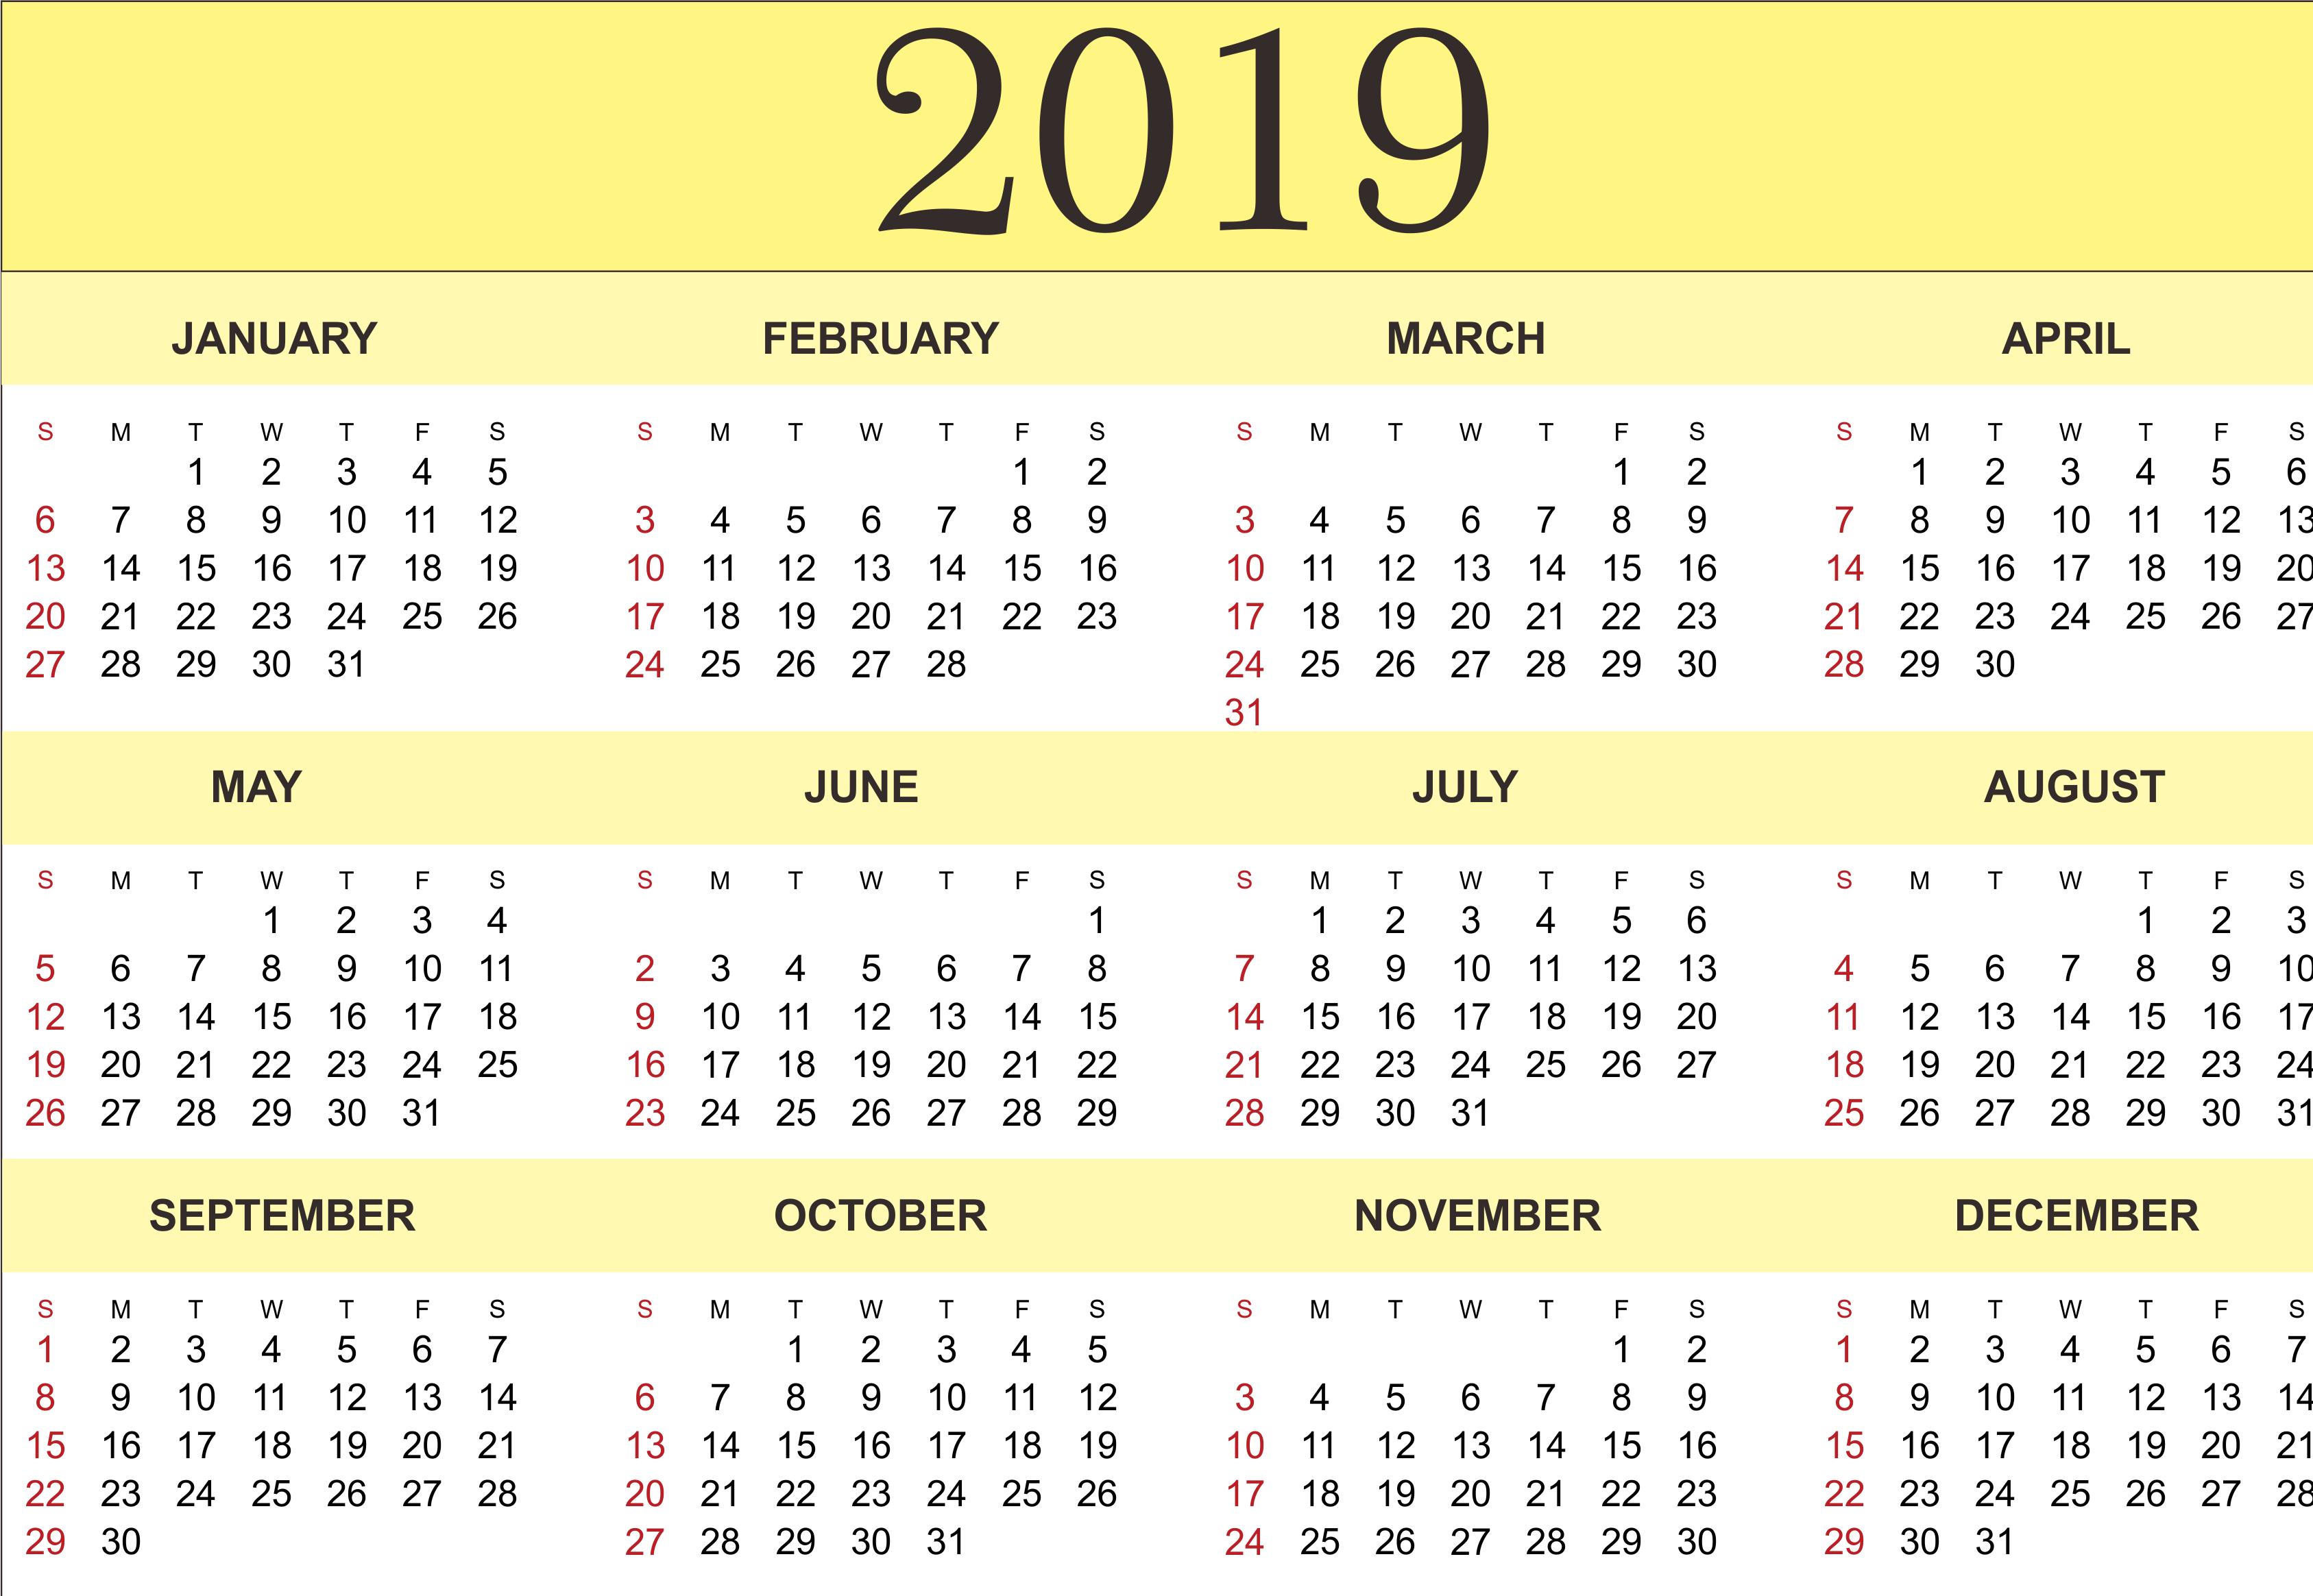 047 Printable Word Sensational 2019 Calendar Free Monthly Template G 2019 Calendar